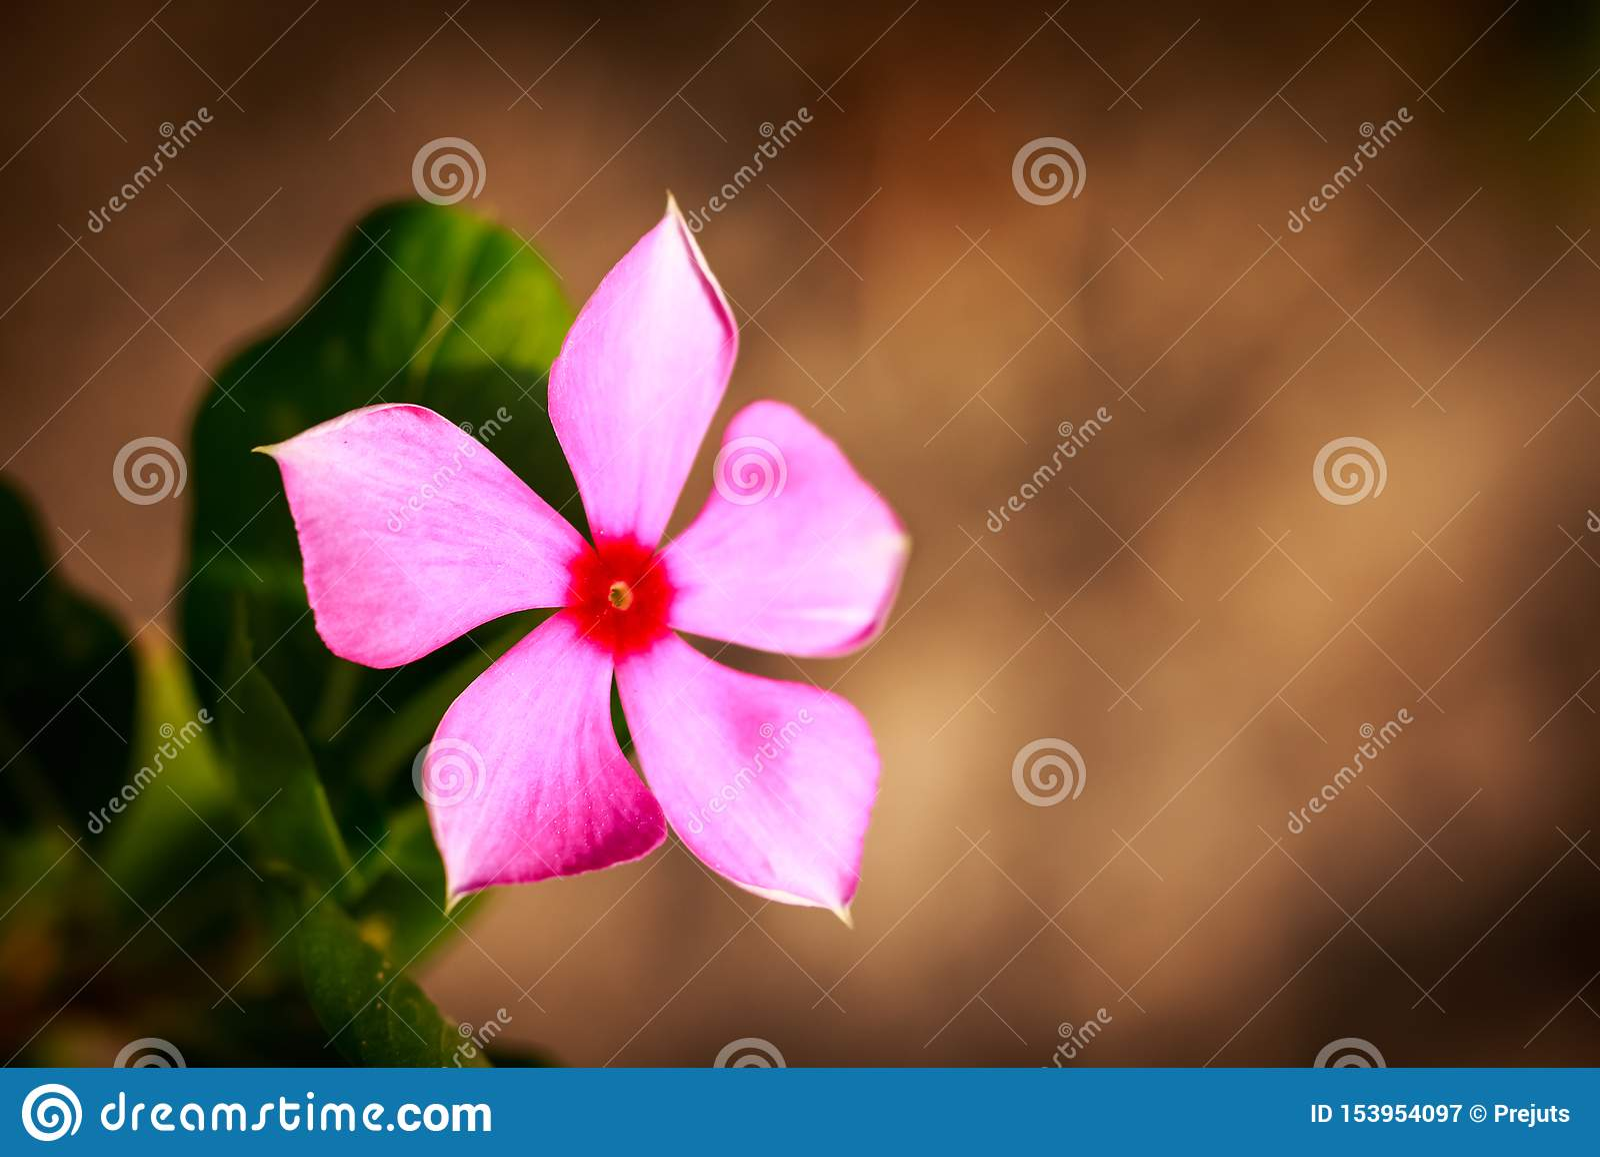 Beautiful Verbena flower in a garden